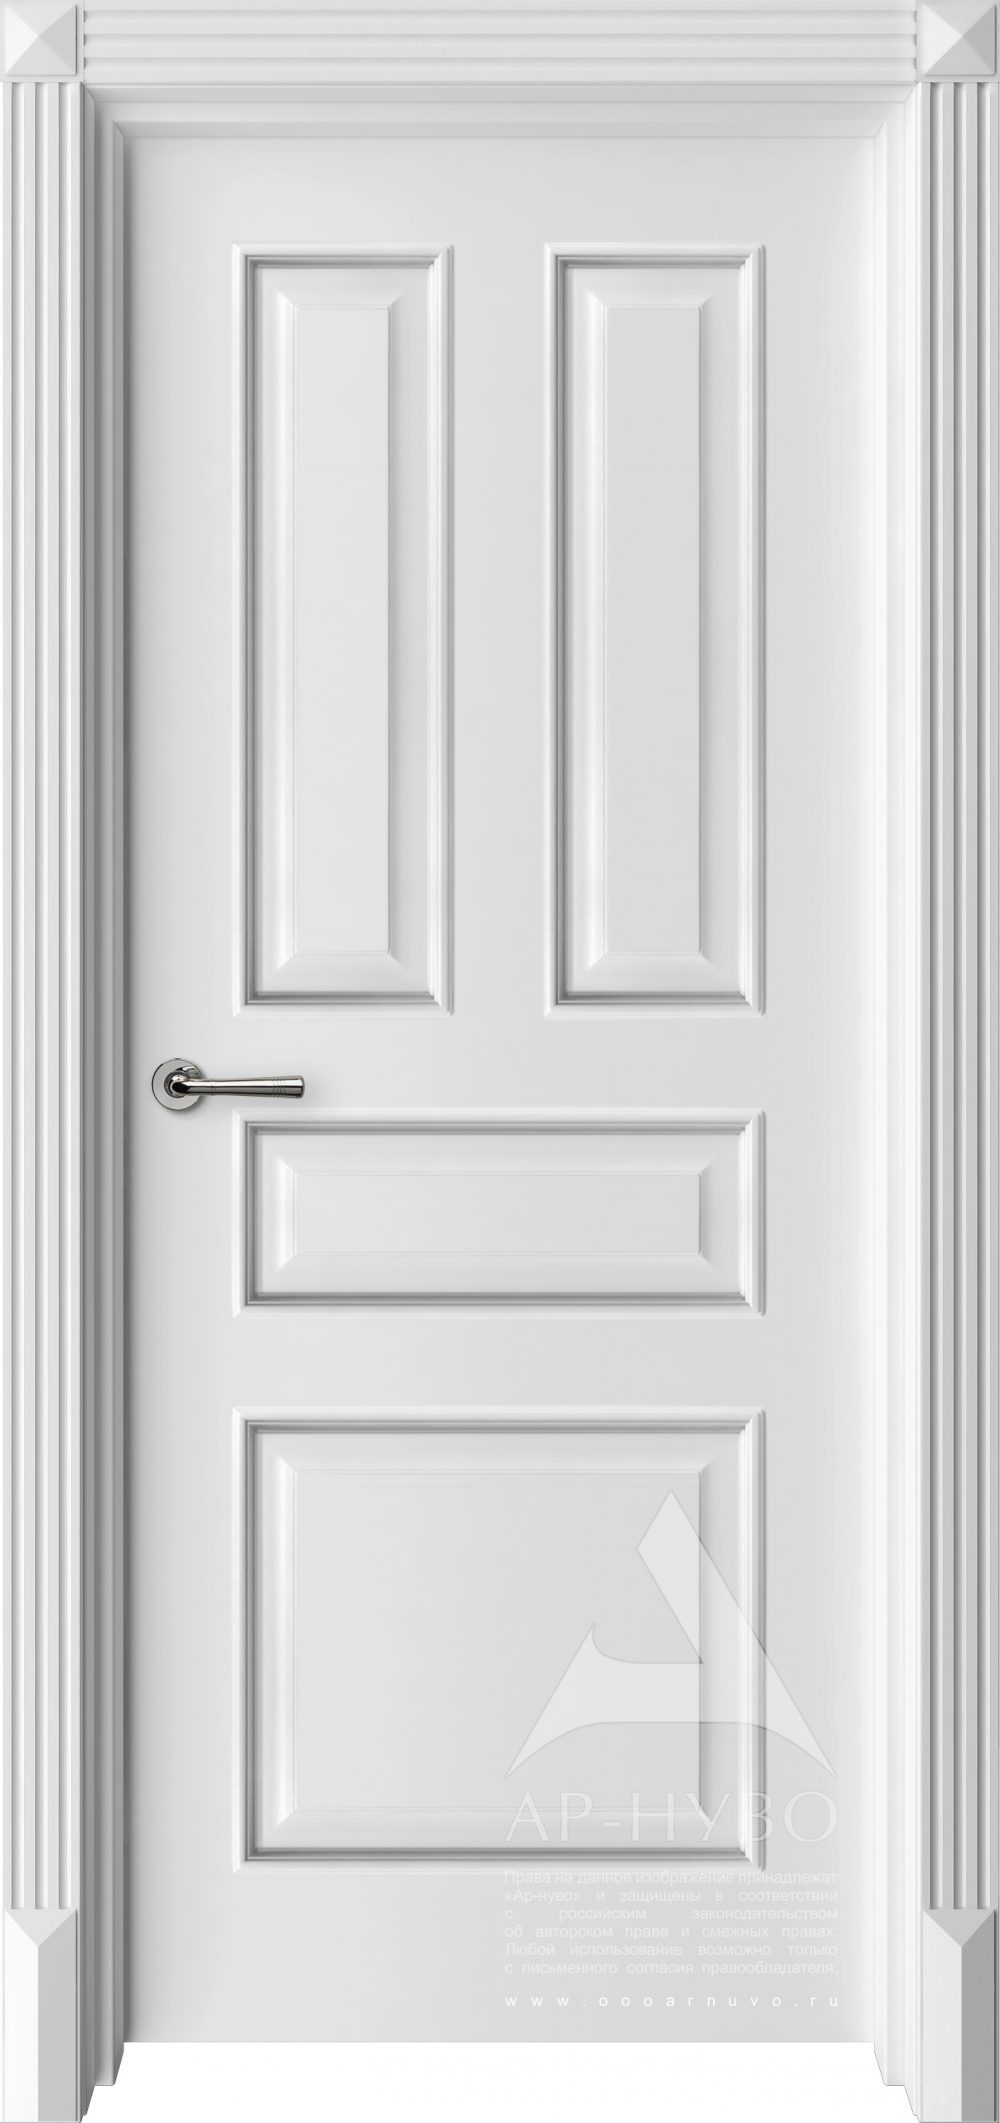 межкомнатная дверь соната с багетом